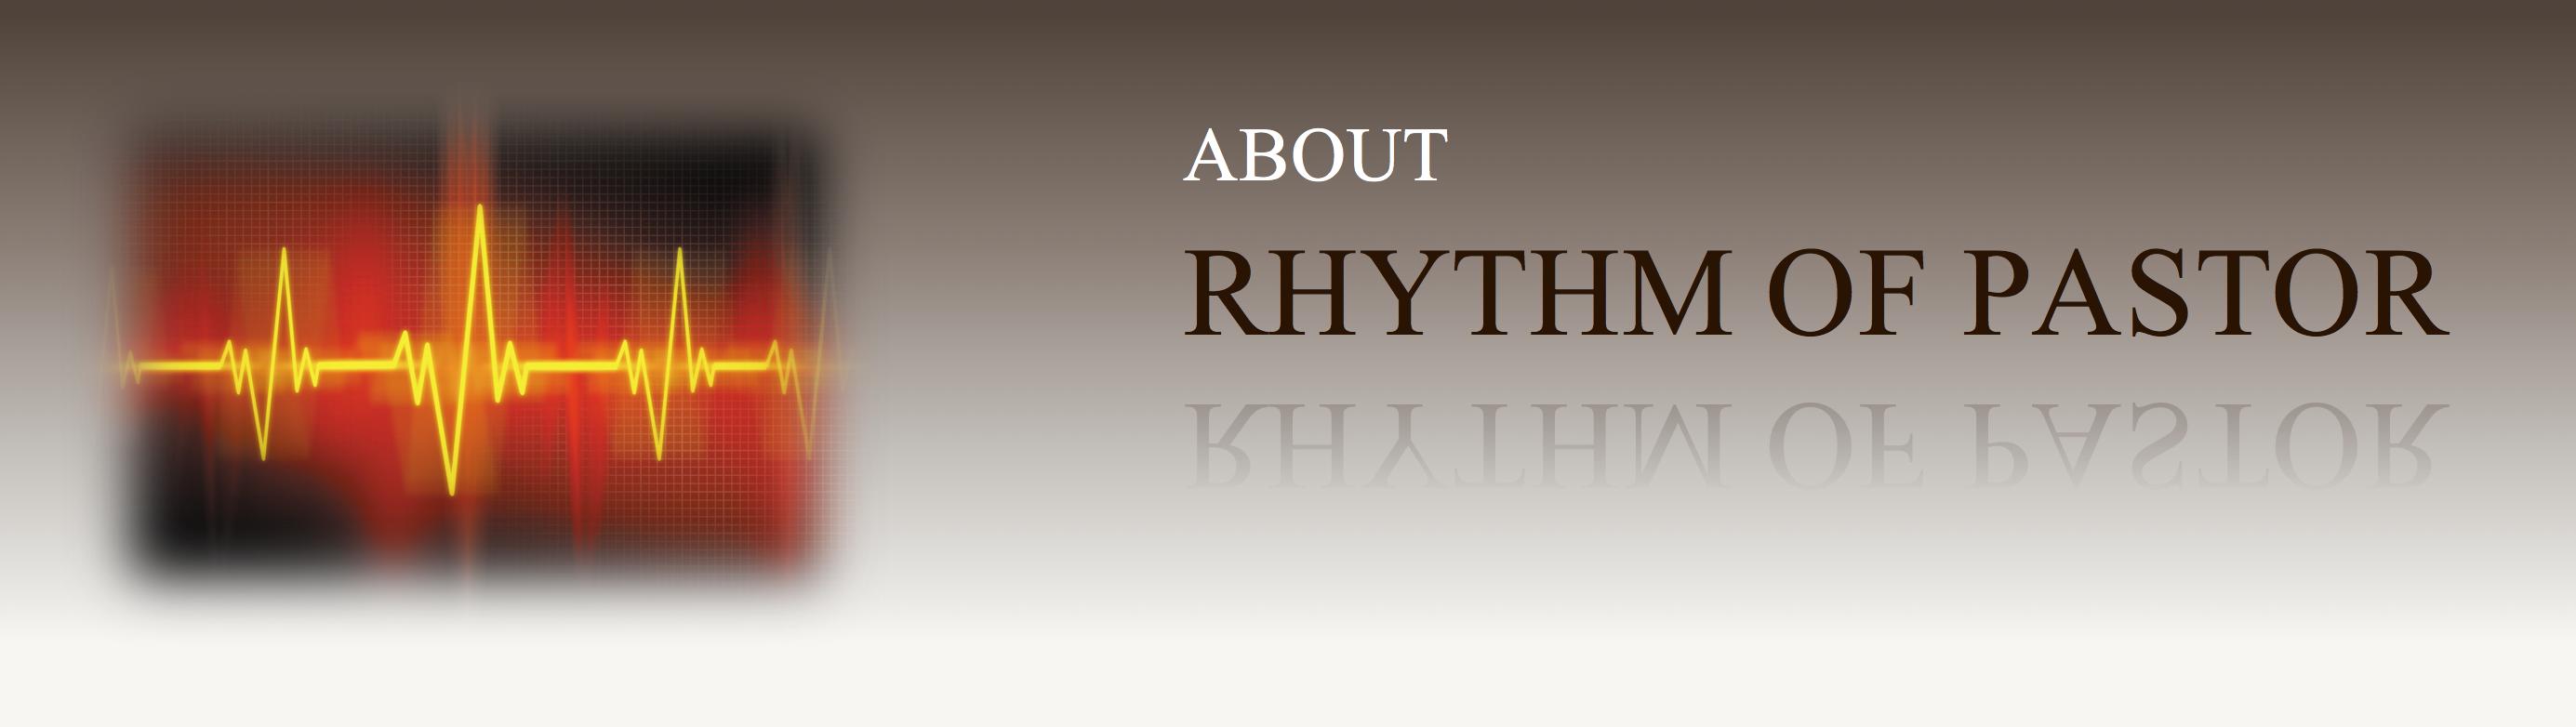 banner-rhythm